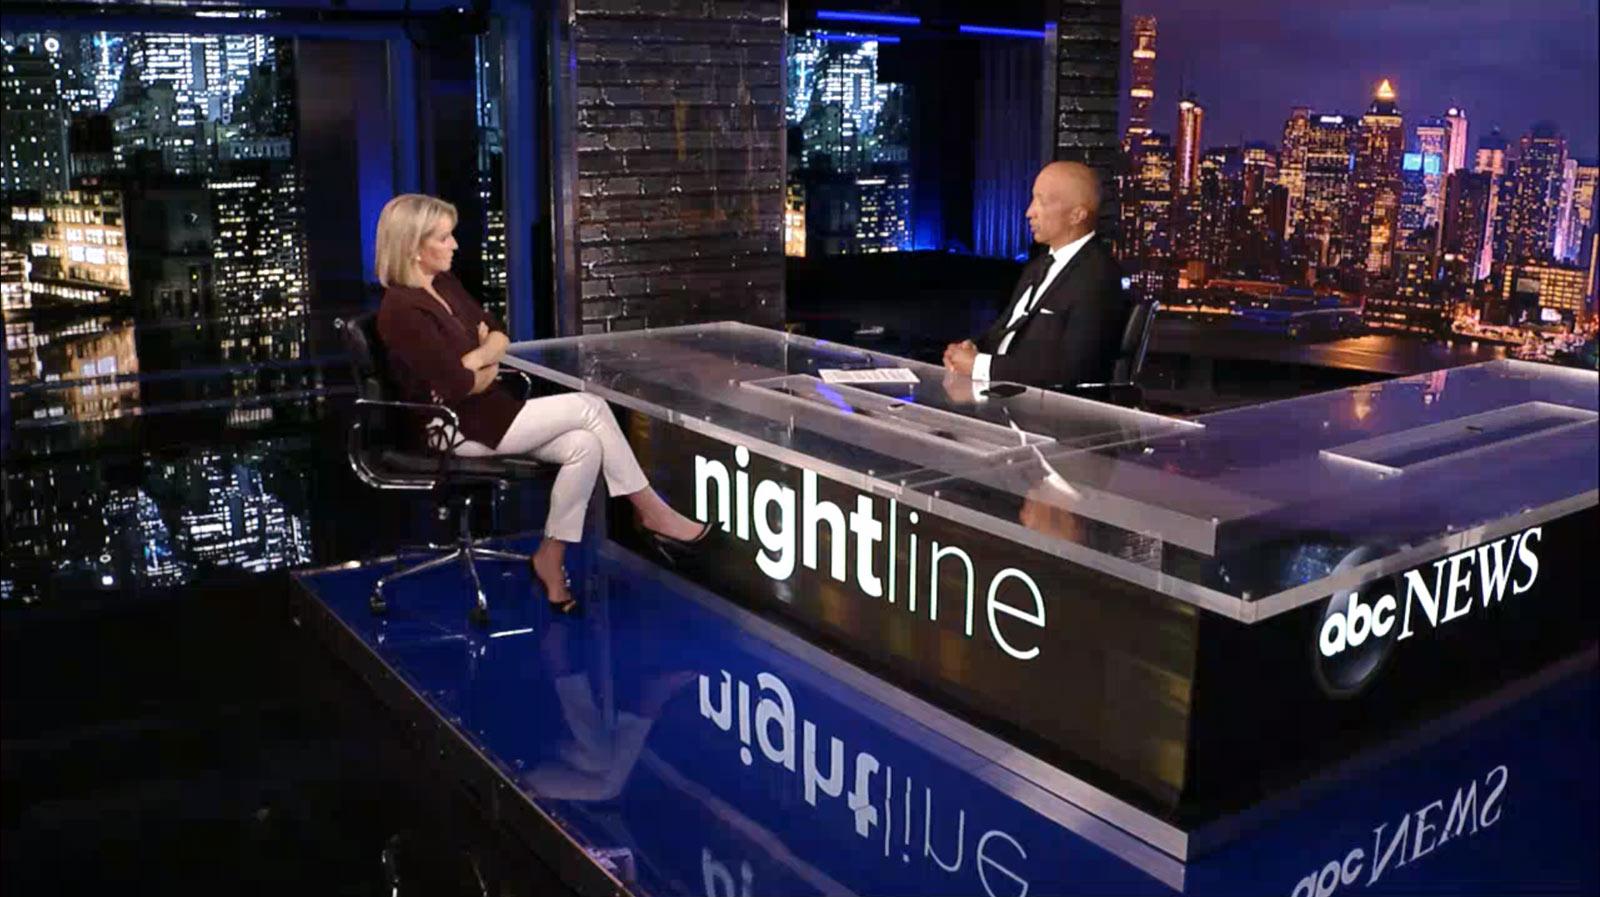 ABC News: Nightline - set screen design by K Brandon Bell